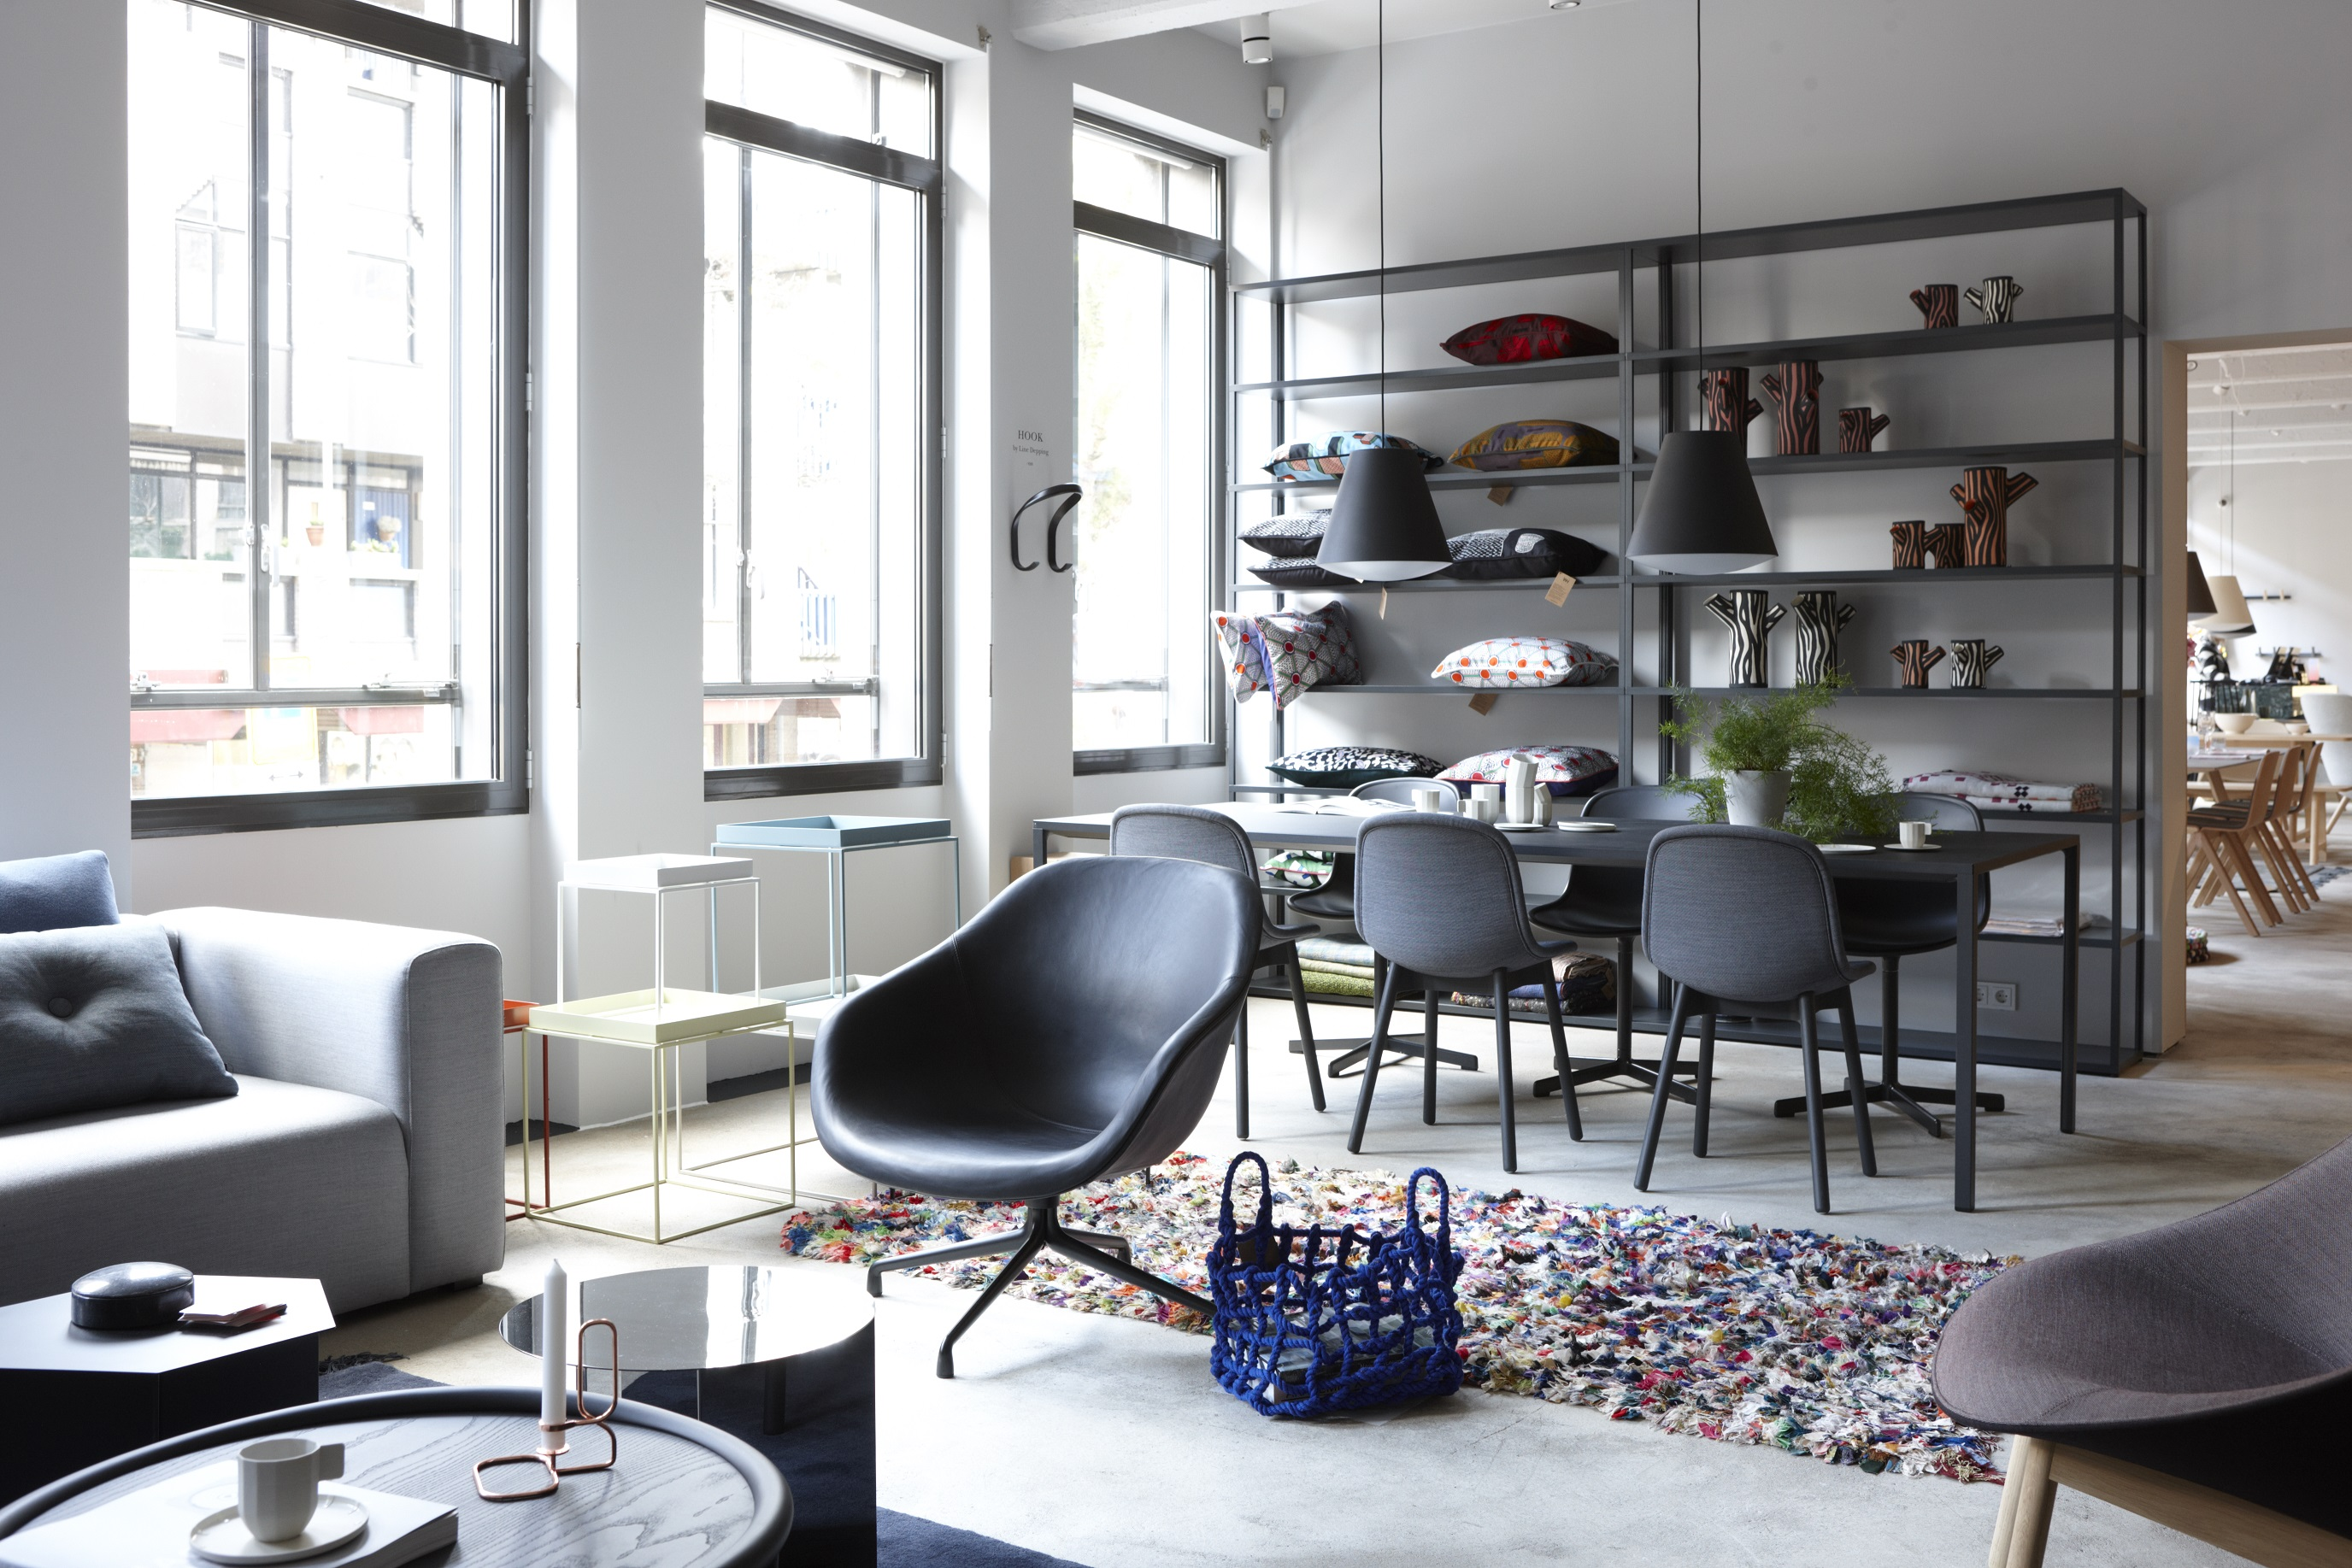 10 mooiste interieurwinkels in Nederland   MAN MAN